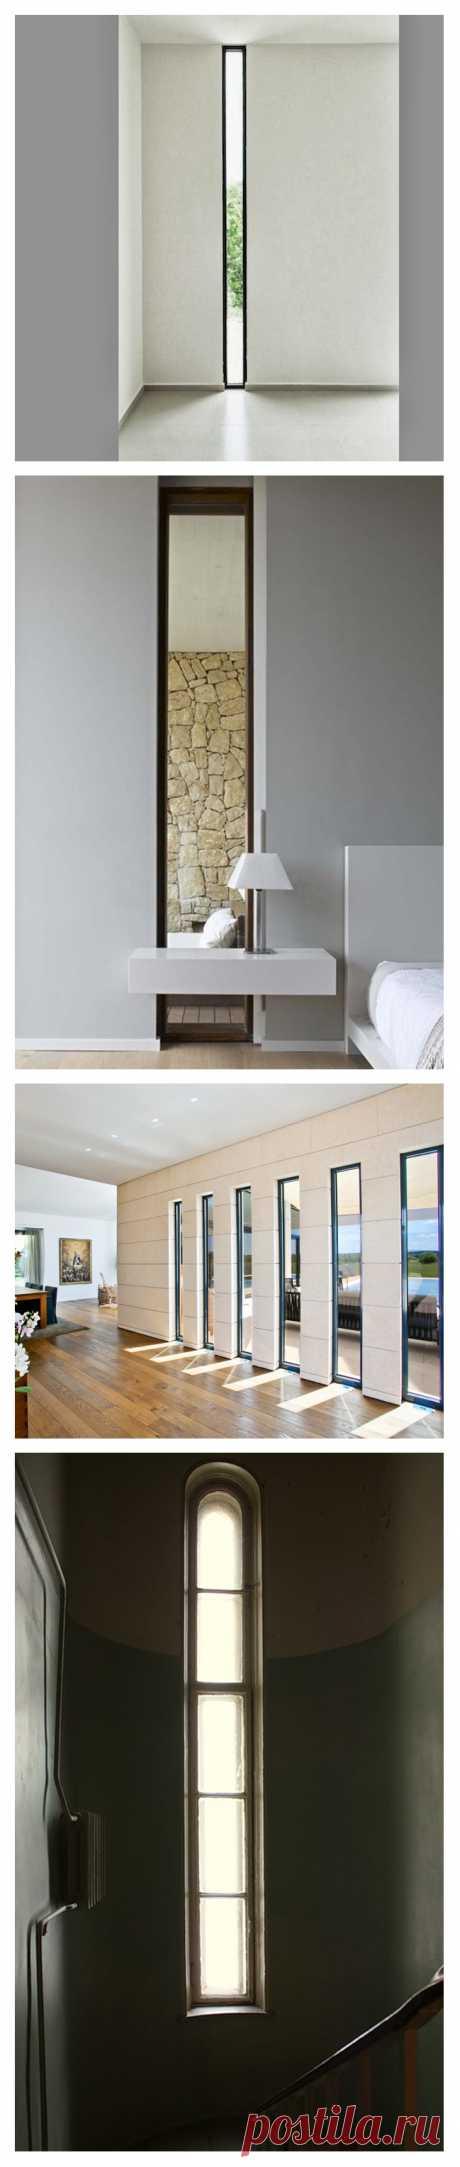 Narrow windows. Headache of builders or effective detail of an interior?